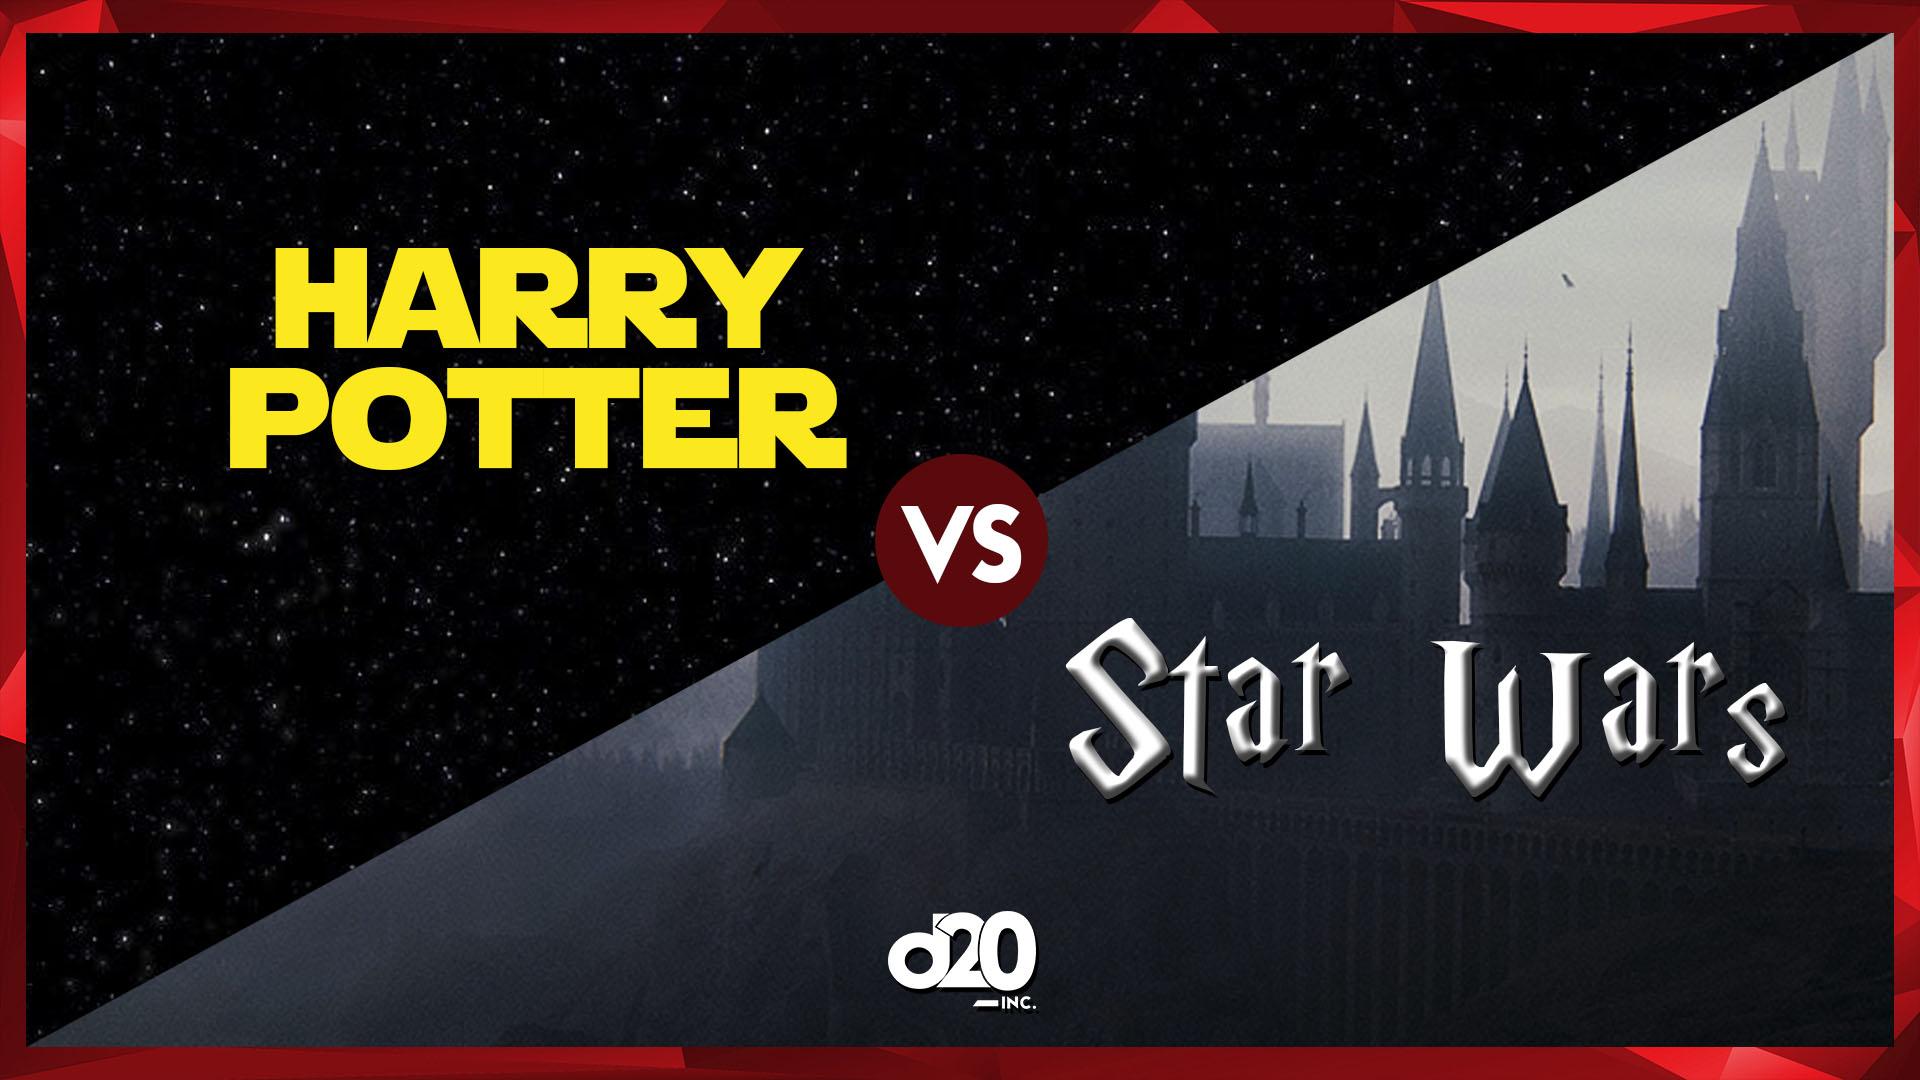 As Semelhanças entre Harry Potter e Star Wars | D20 Lab 59